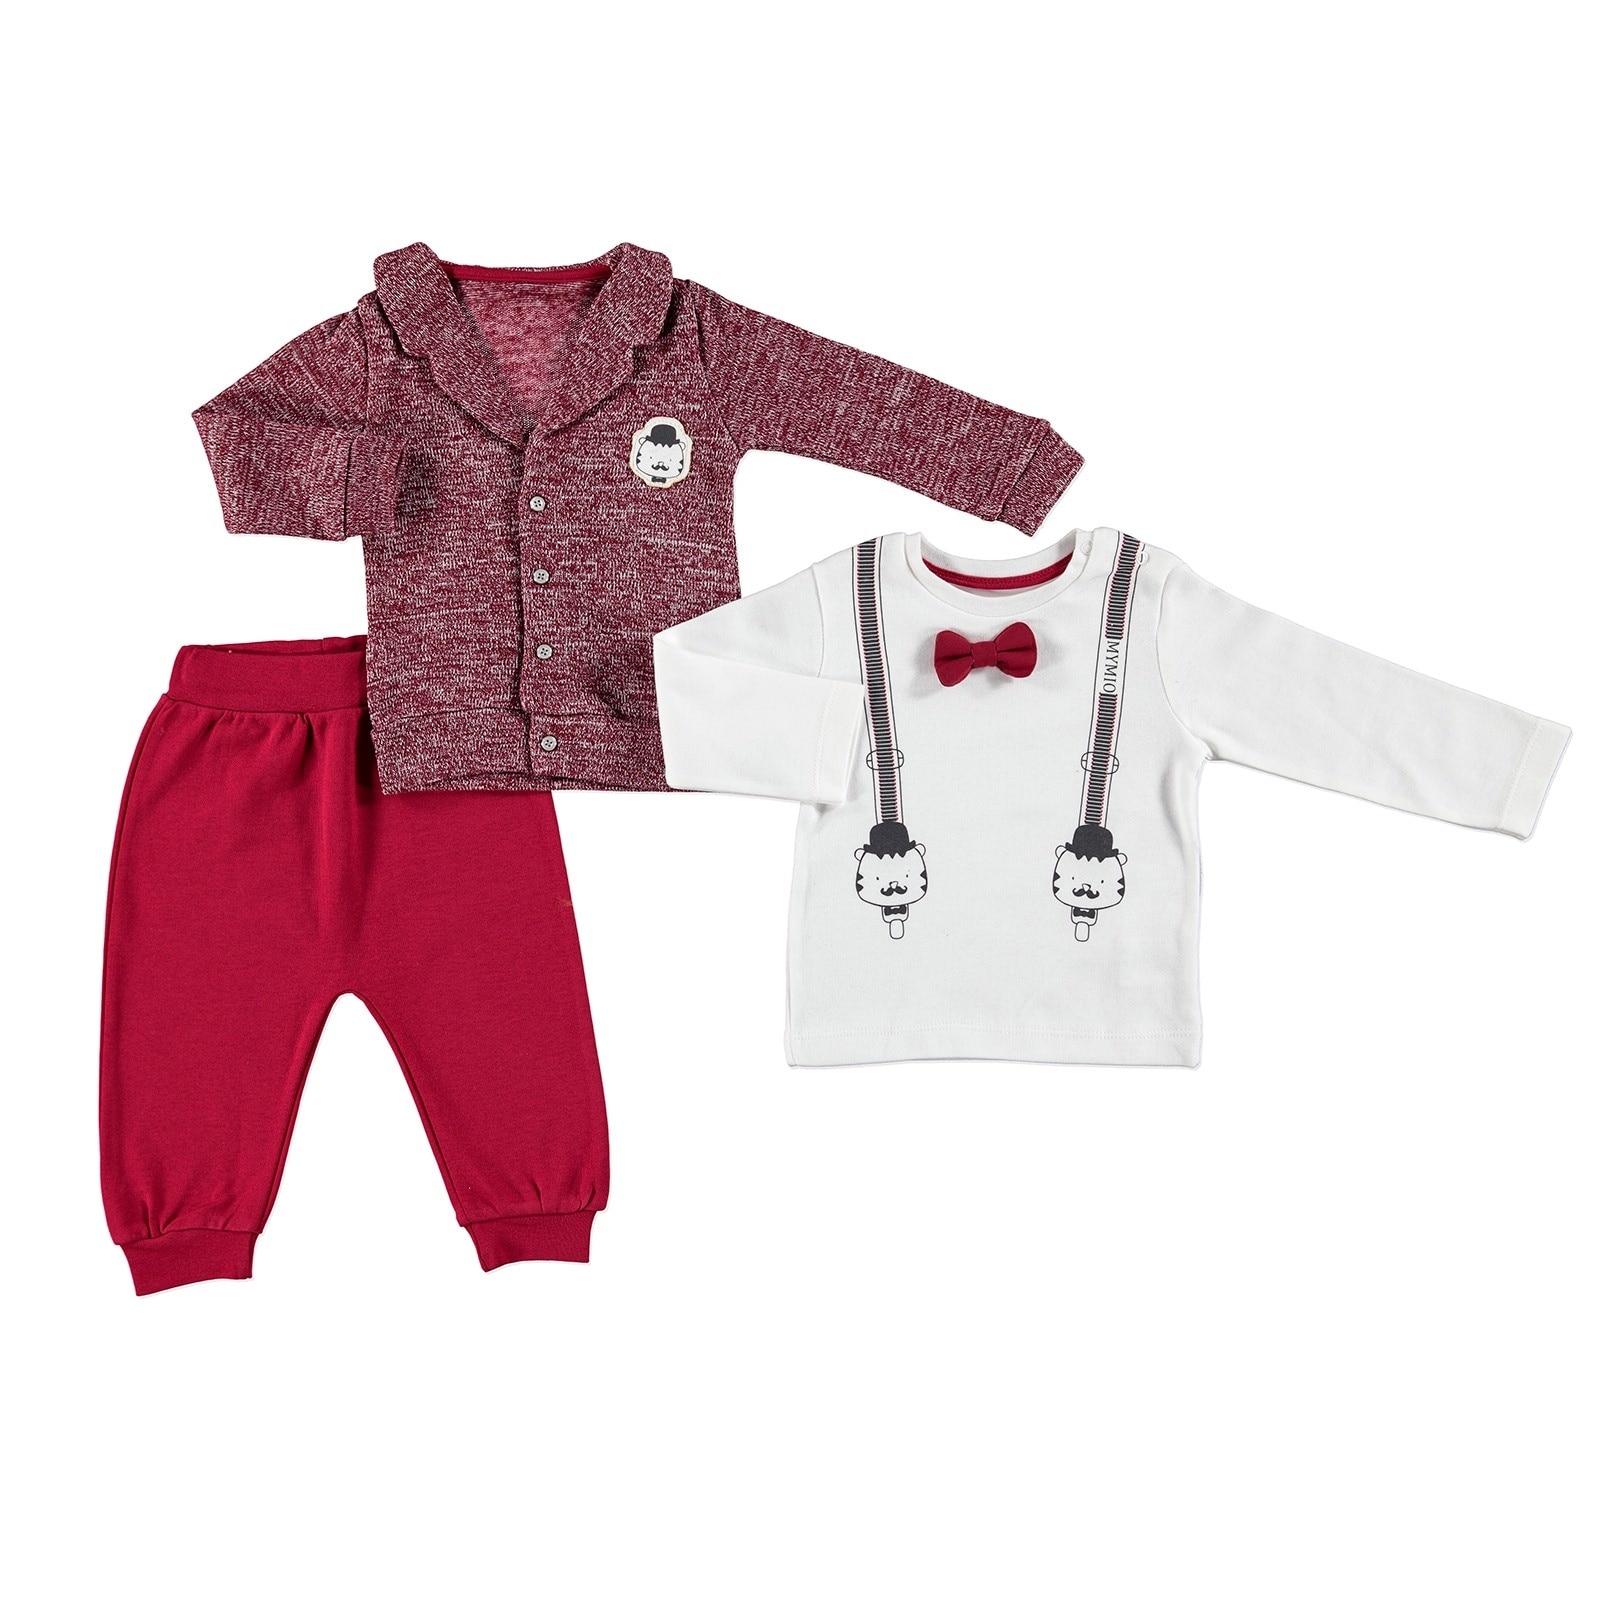 Ebebek Mymio Monsieur Baby Printed Sweatshirt Cardigan Trouser Set 3 Pcs